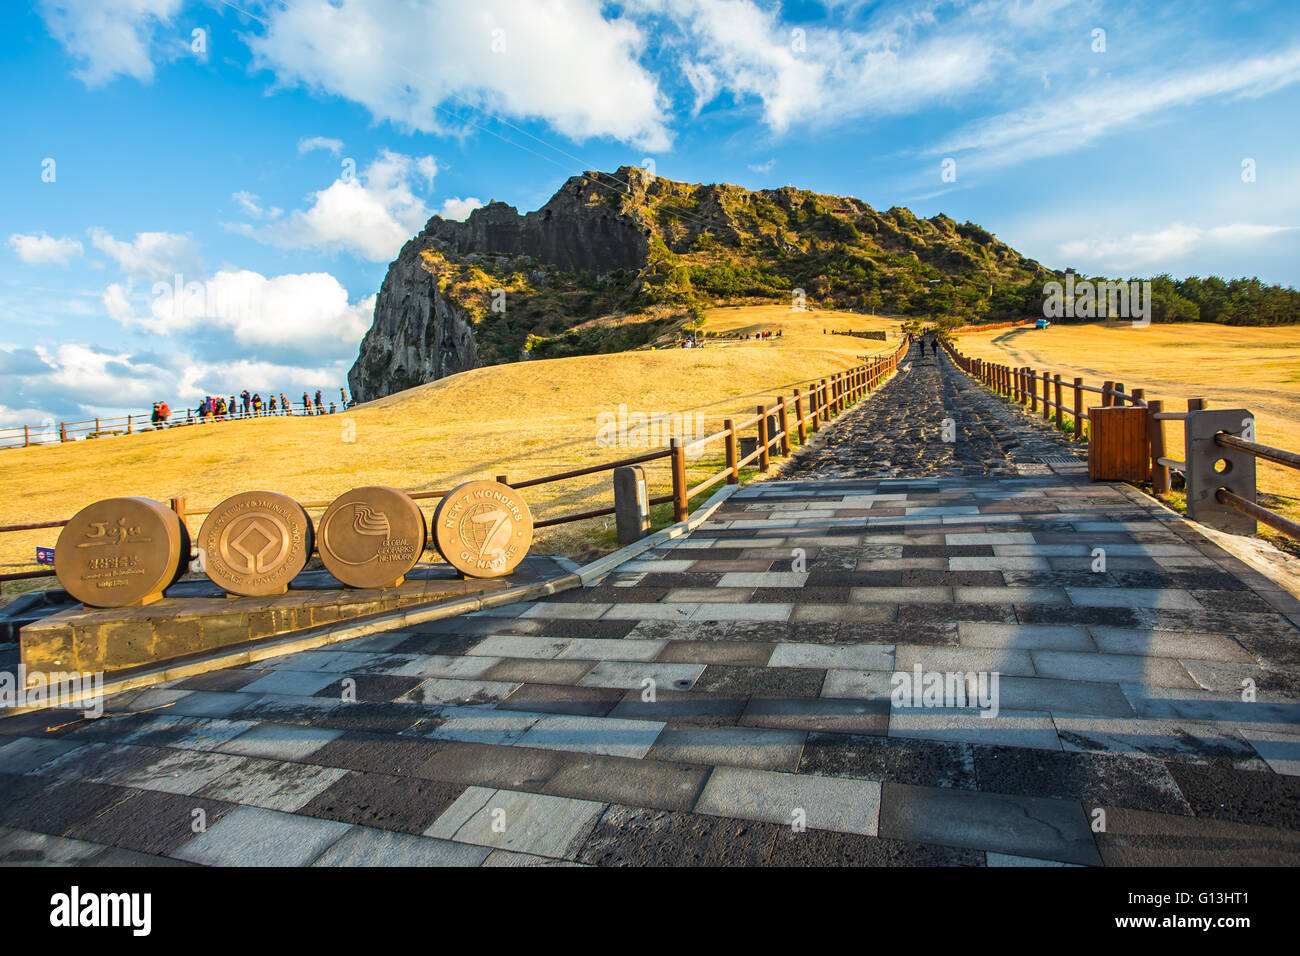 View of Seongsan Ilchulbong moutain in Jeju Island, South Korea. - Stock Image